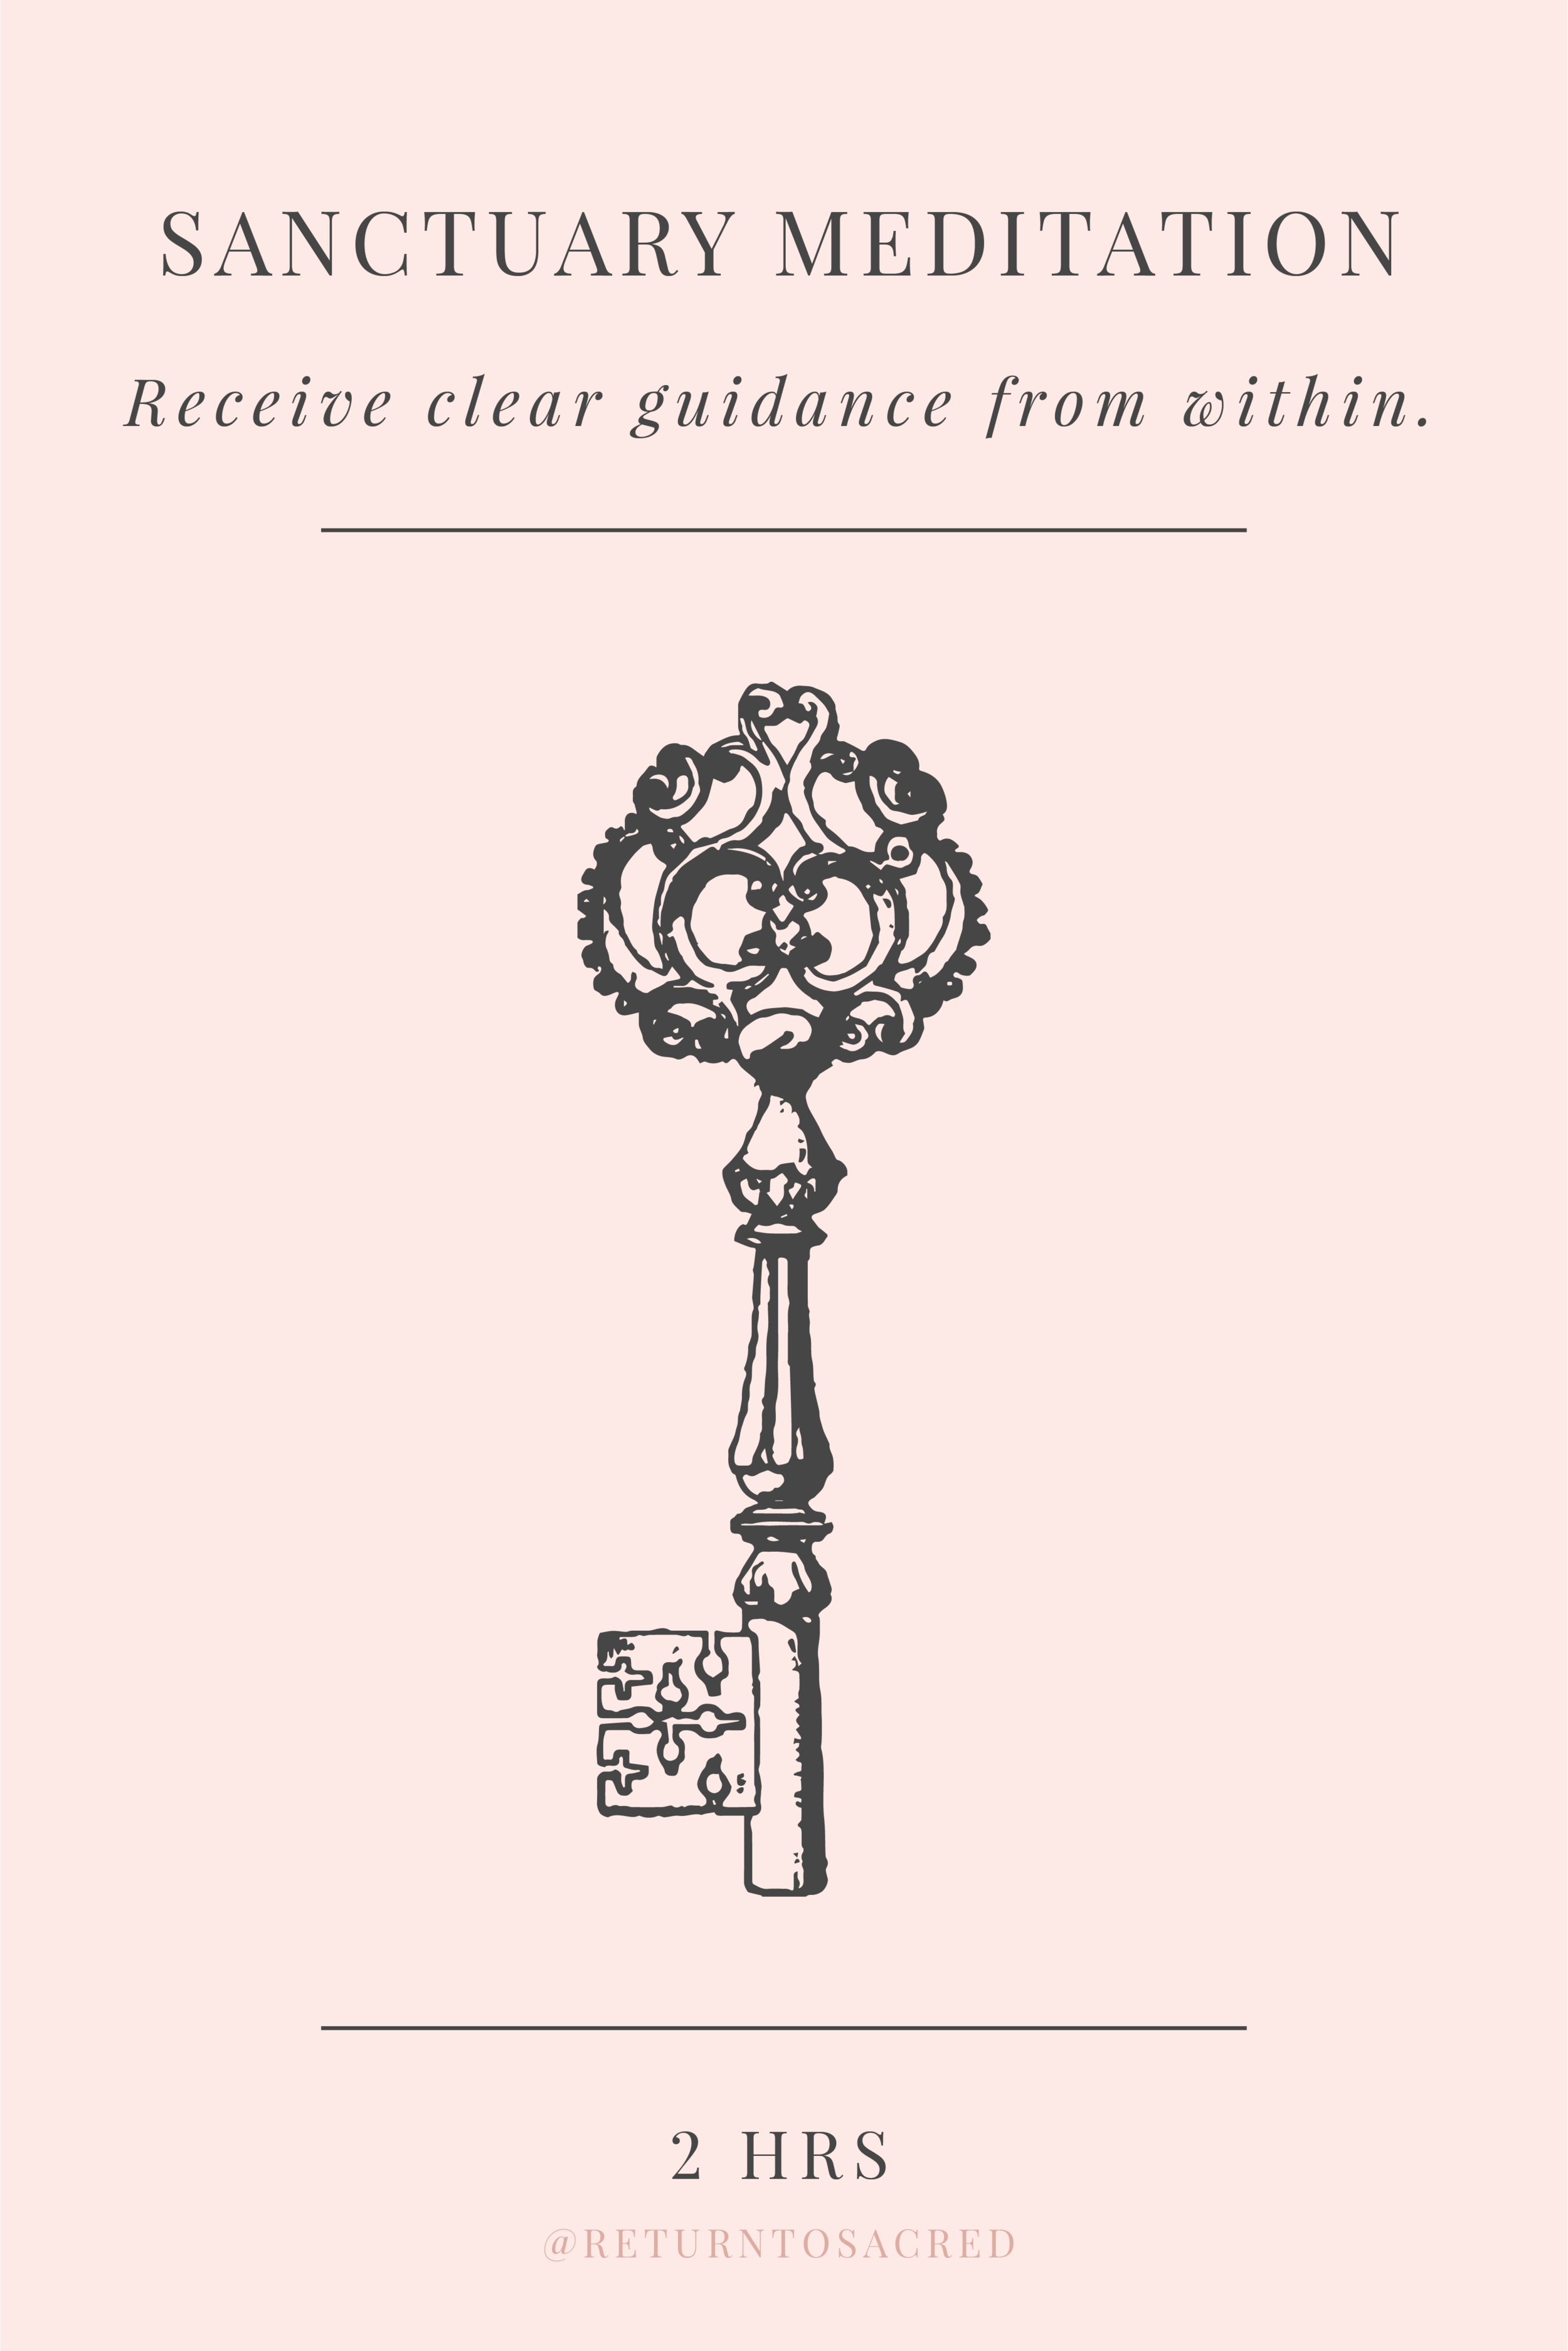 Sanctuary-Meditation-Card.png